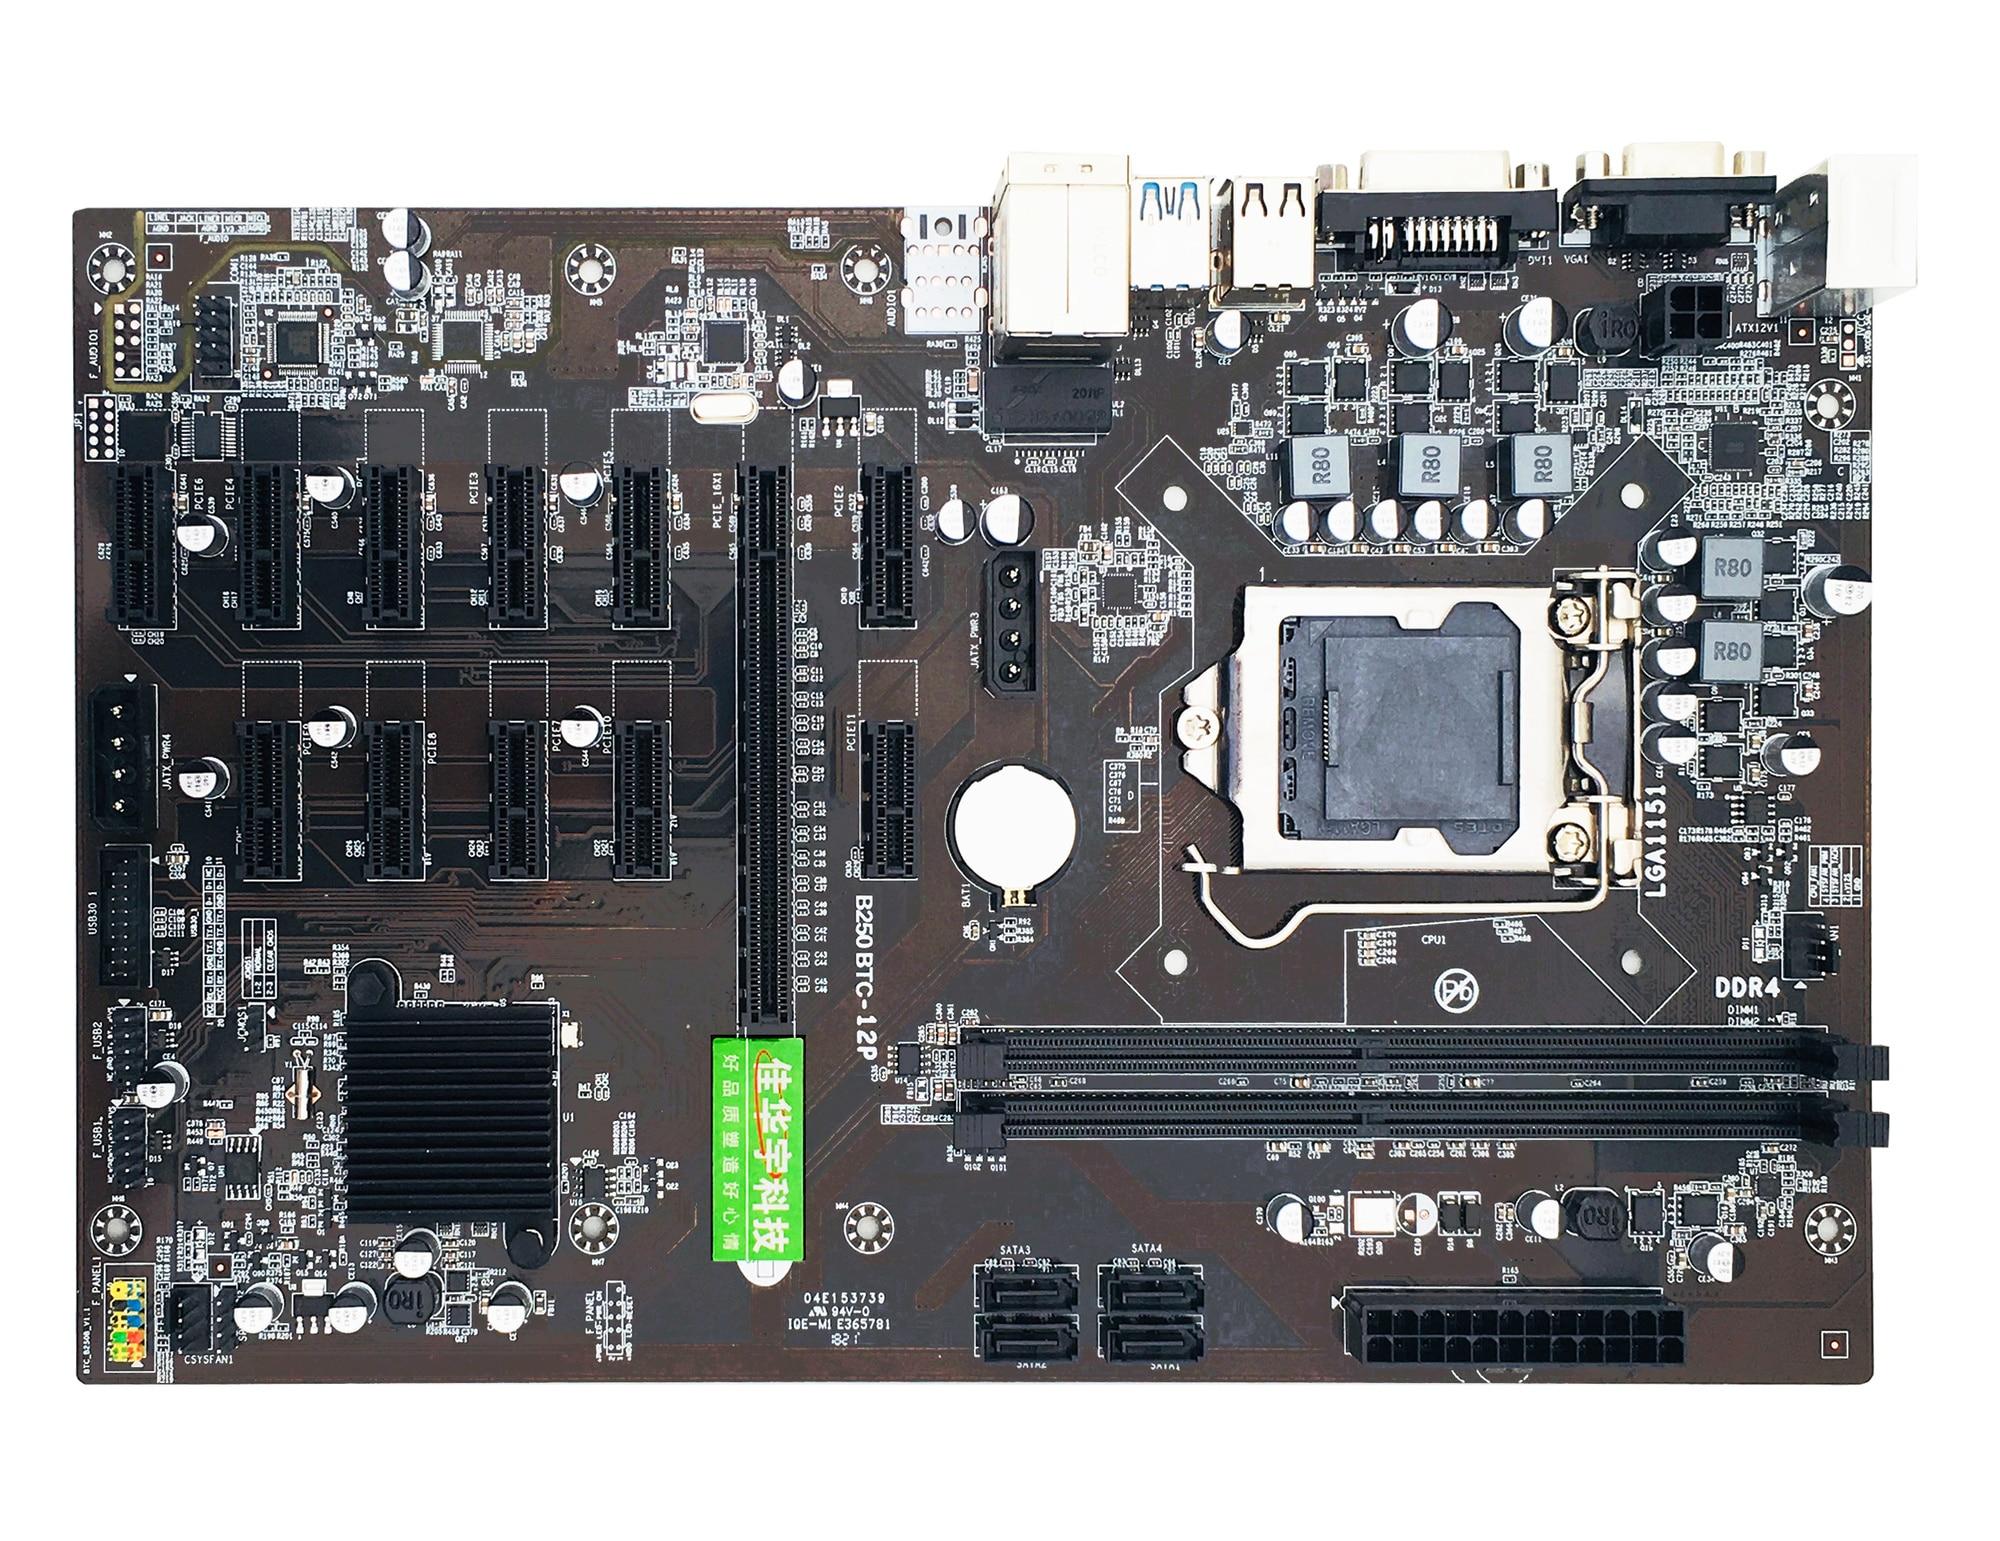 New B250 BTC Mining Machine Motherboard 12 16X Graph Card SODIMM DDR4 SATA3.0 Support VGA Compatible A08 21 Dropship enlarge